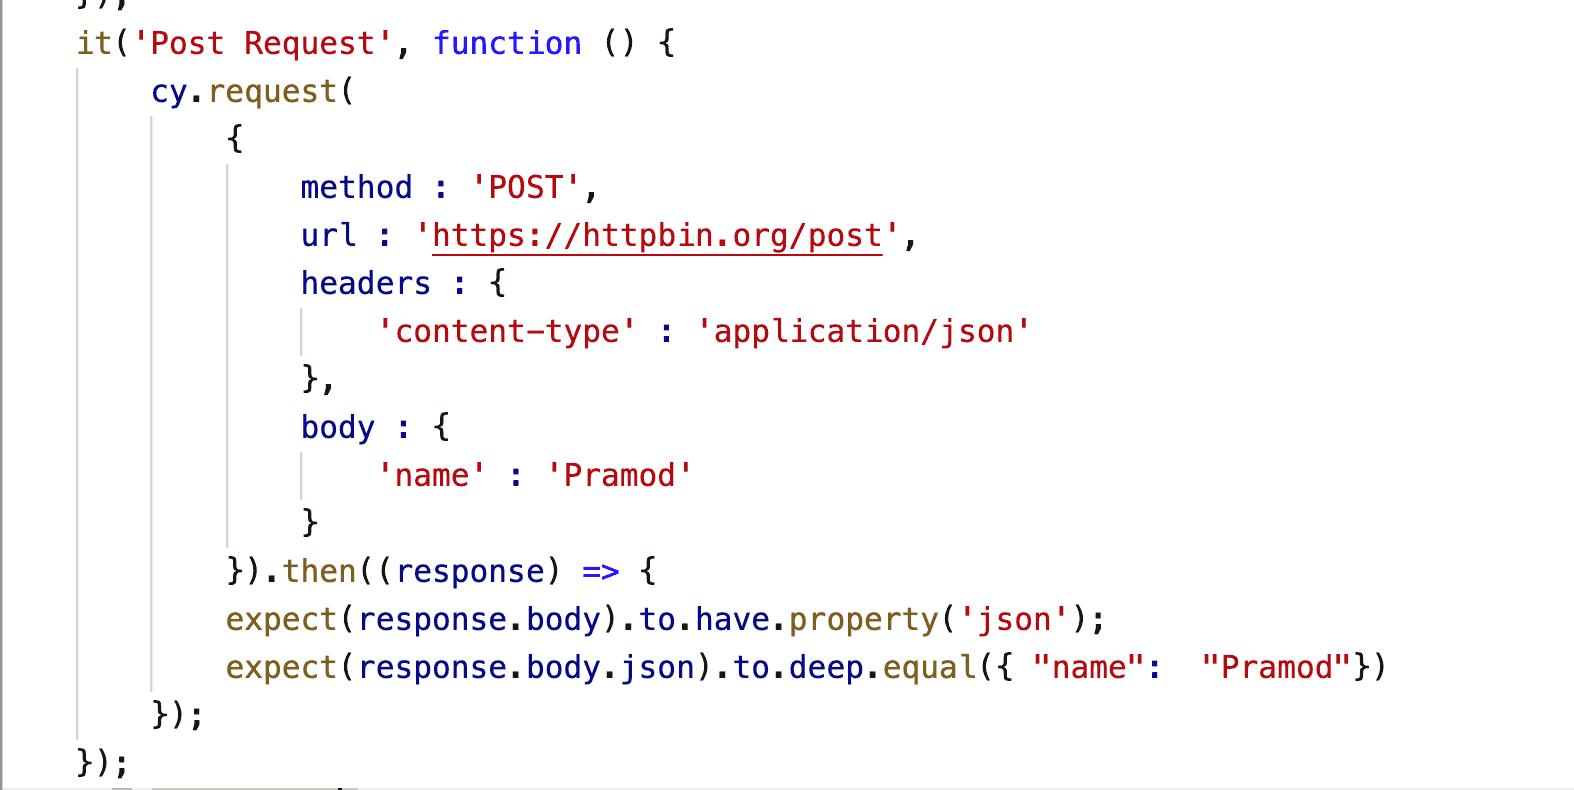 cypress api testing example